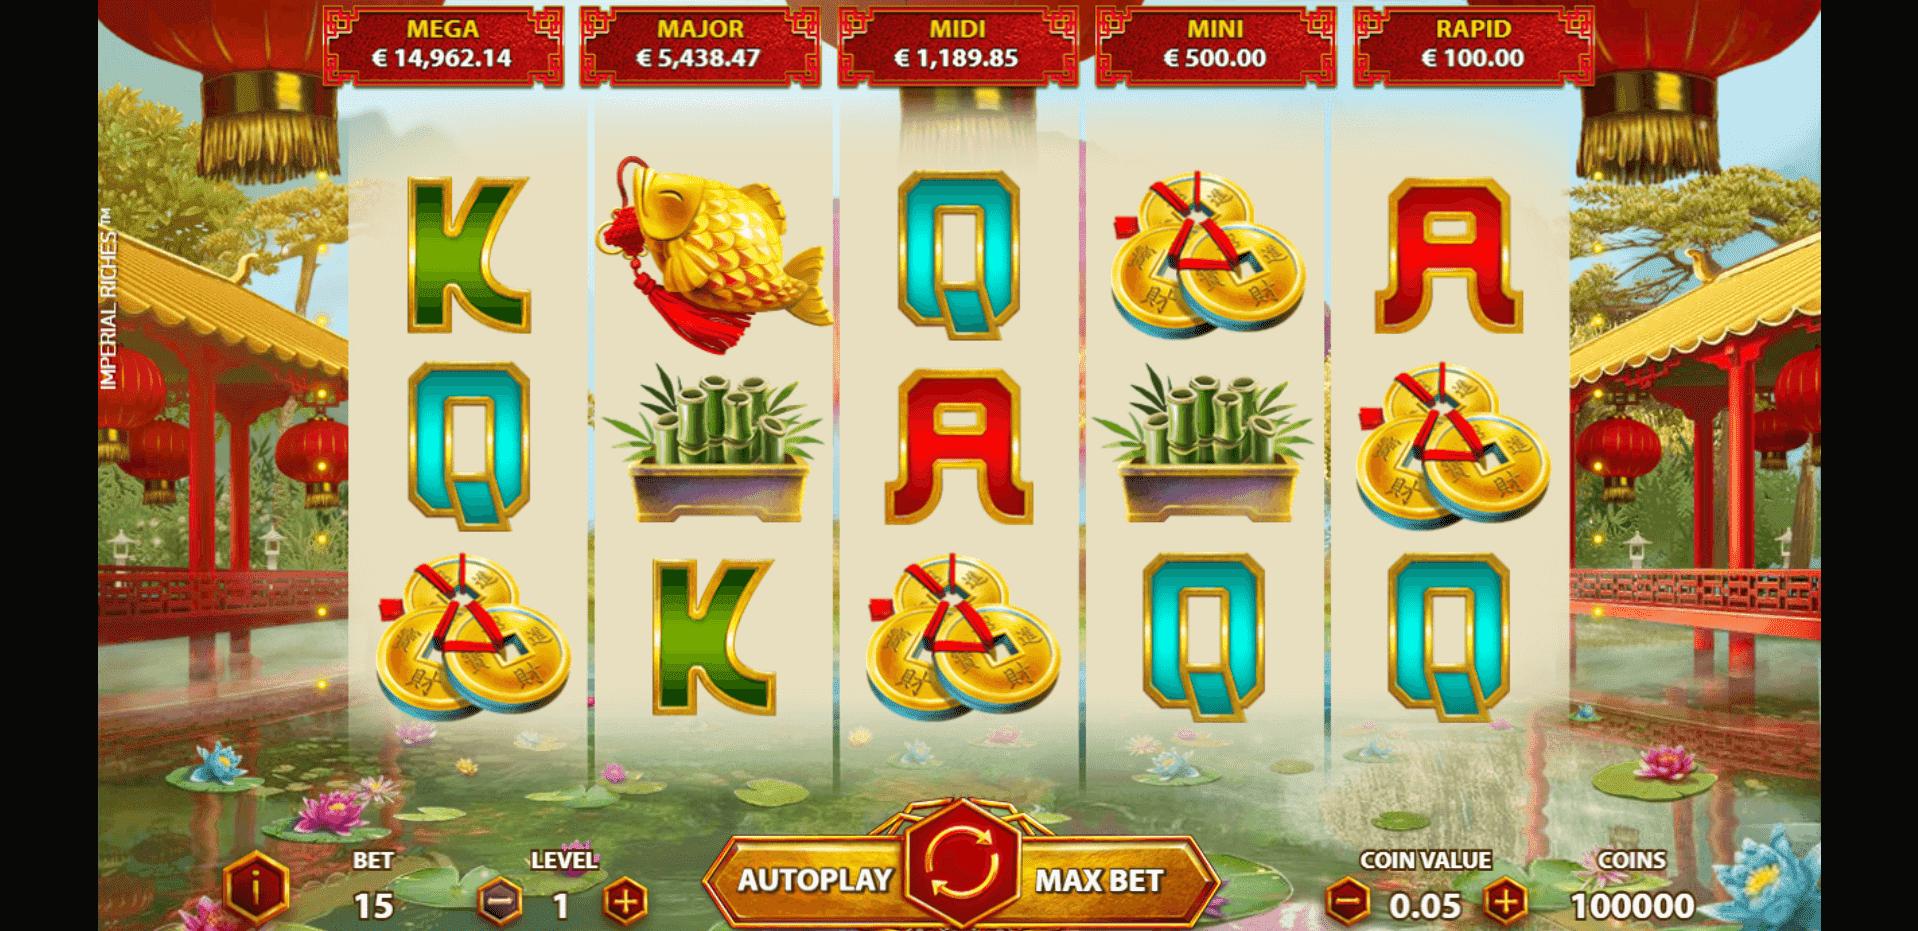 Imperial Riches slot machine screenshot